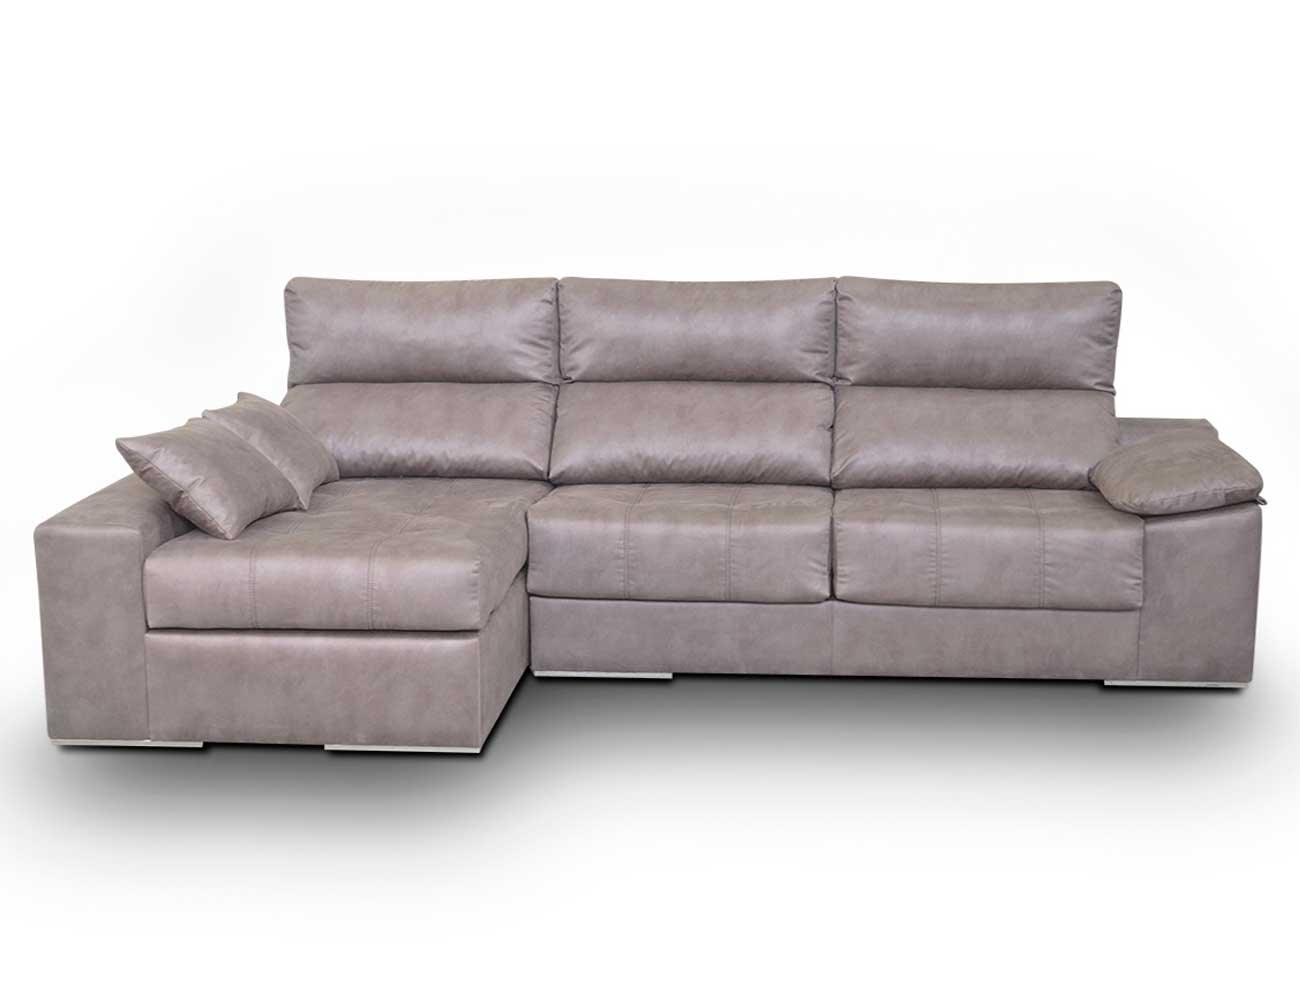 4938_sofa chaiselongue moderno asientos extraibles muy comodo dobles pespuntes donatella4